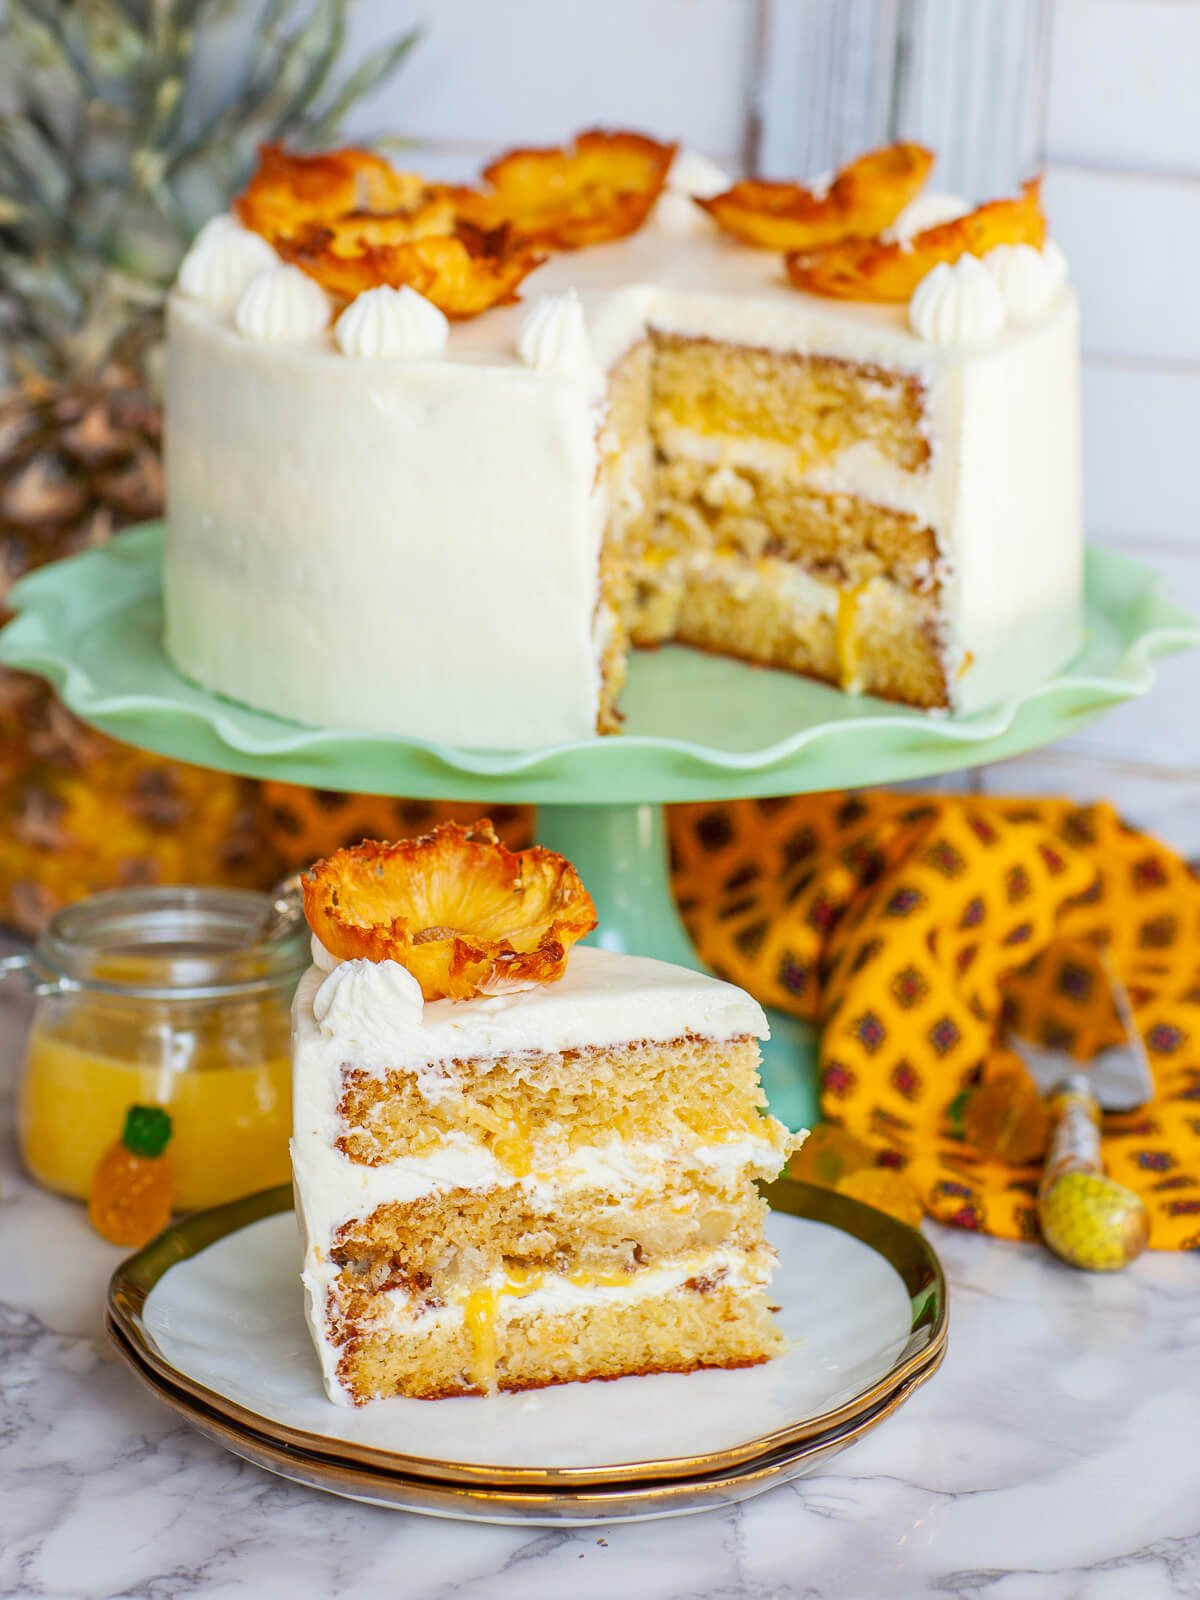 sliced pineapple cake on cake stand and cake slice on plate